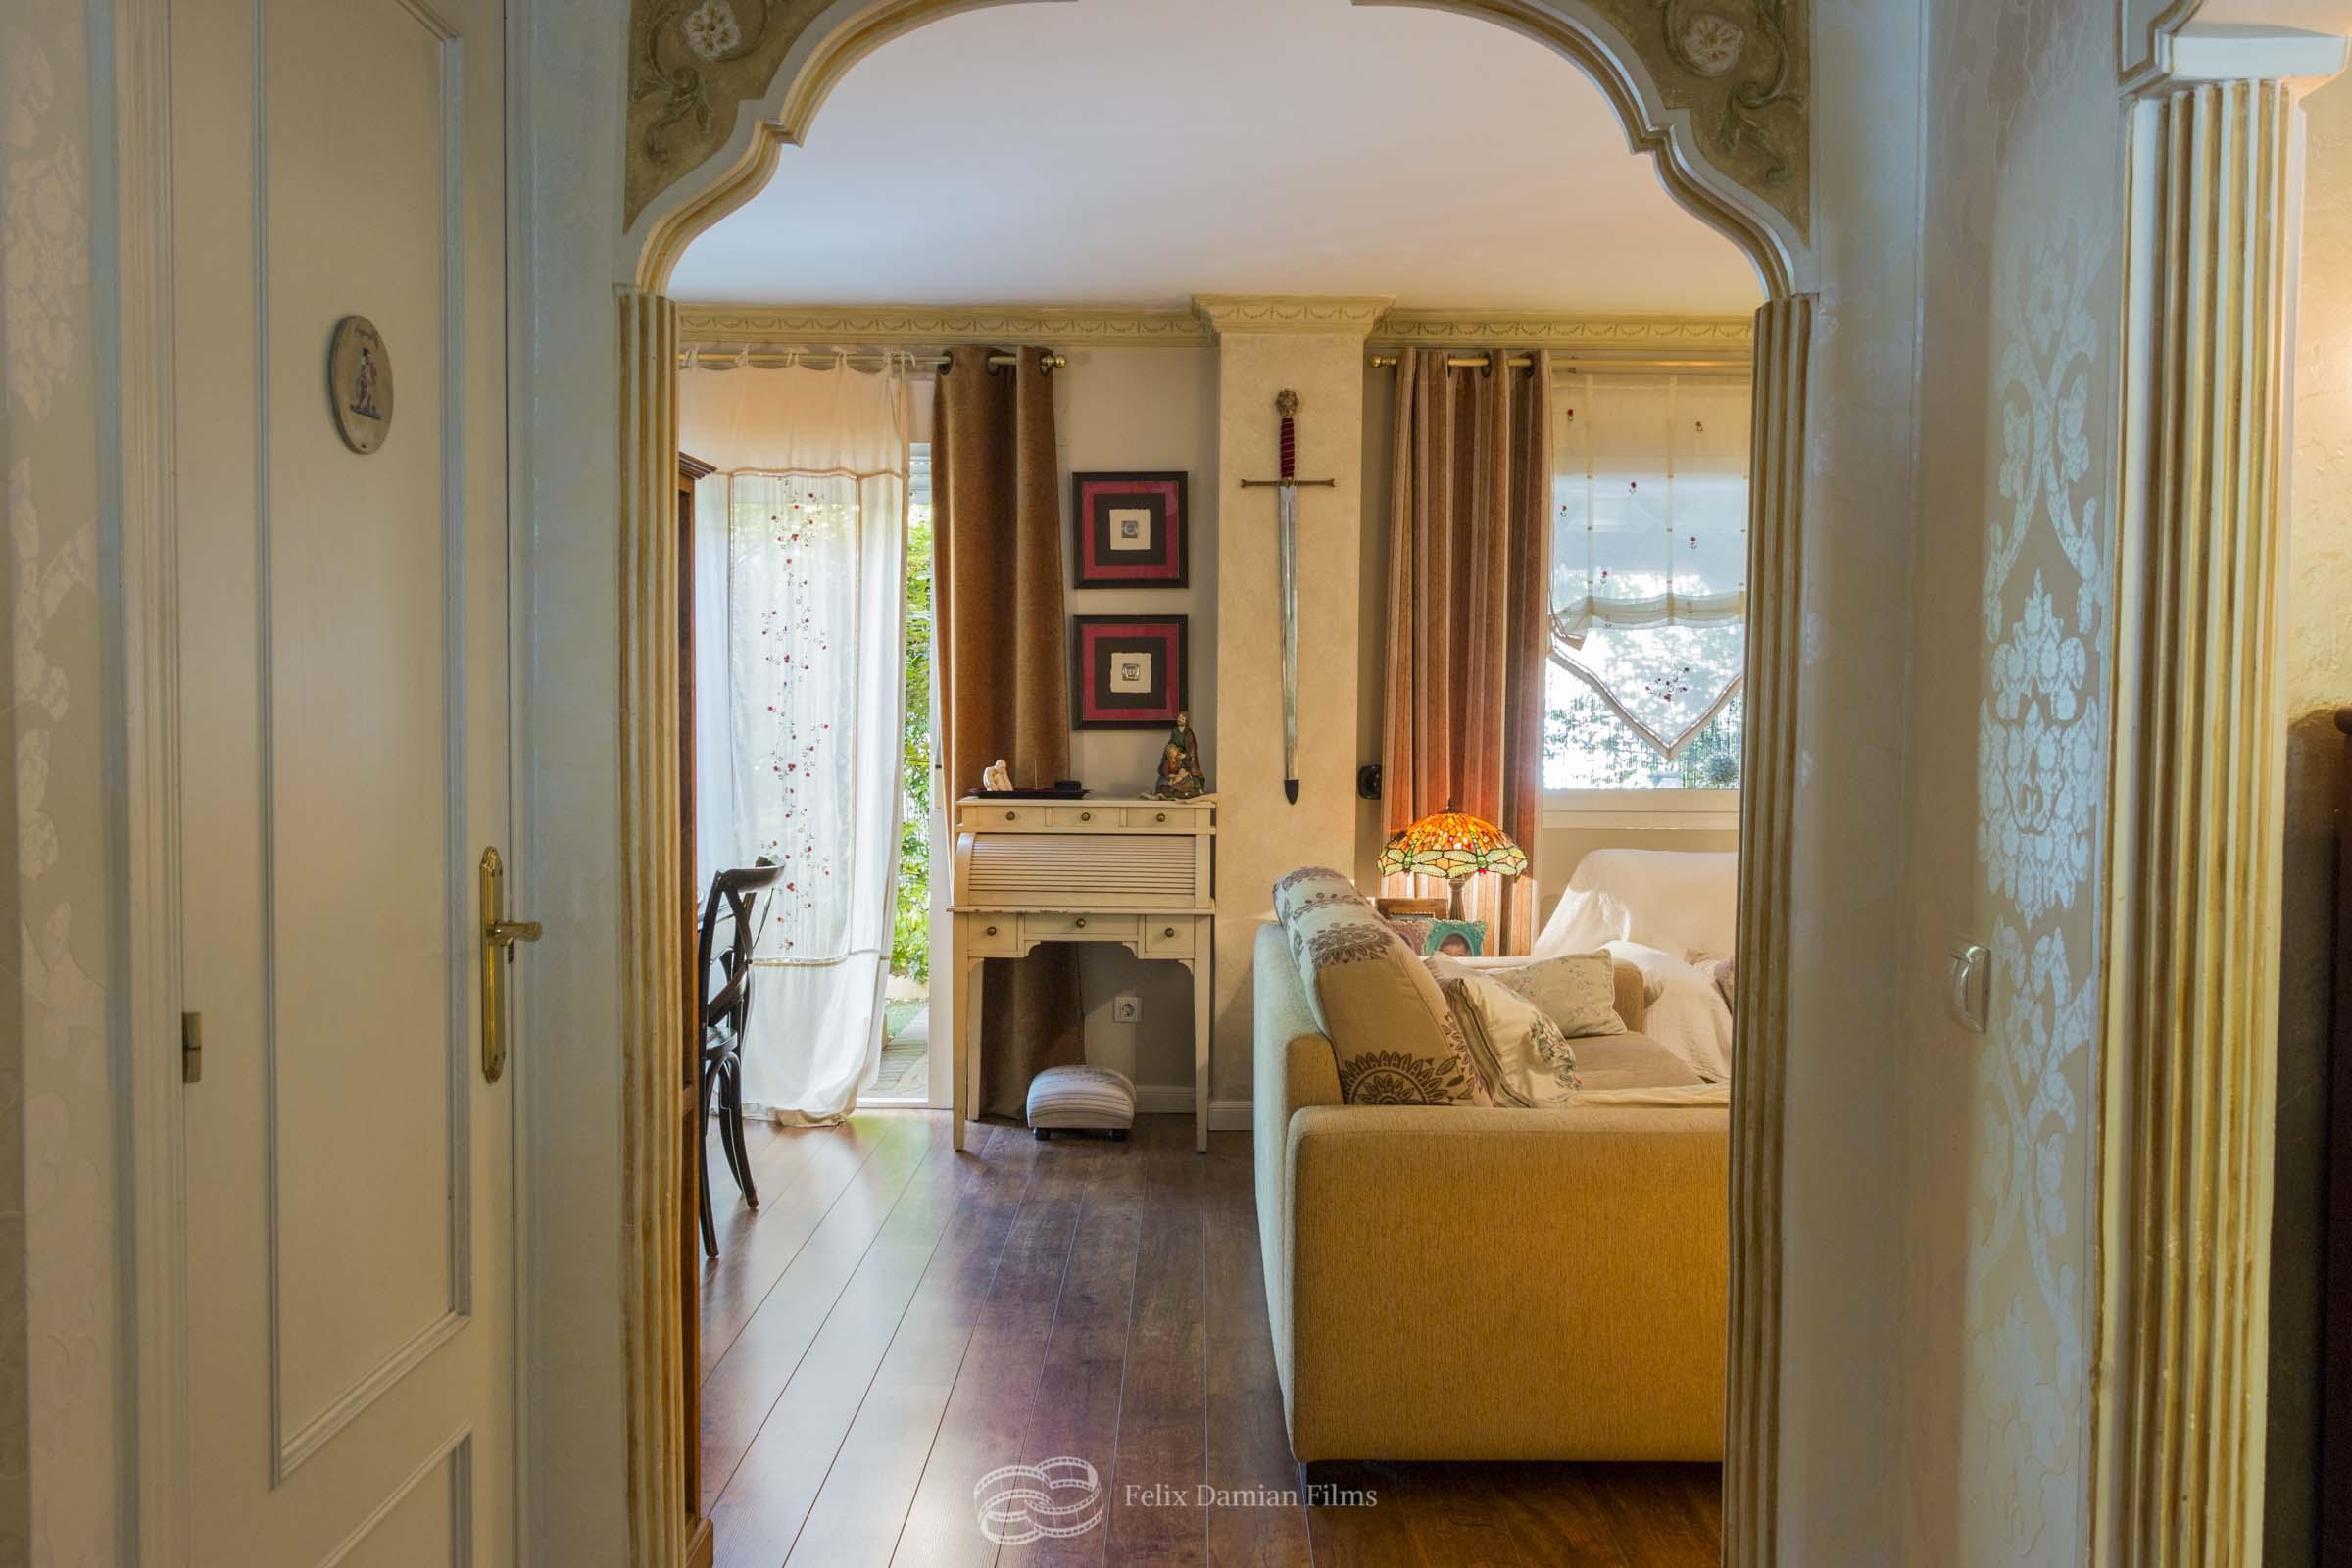 real estate fotografo de interiores madrid-8